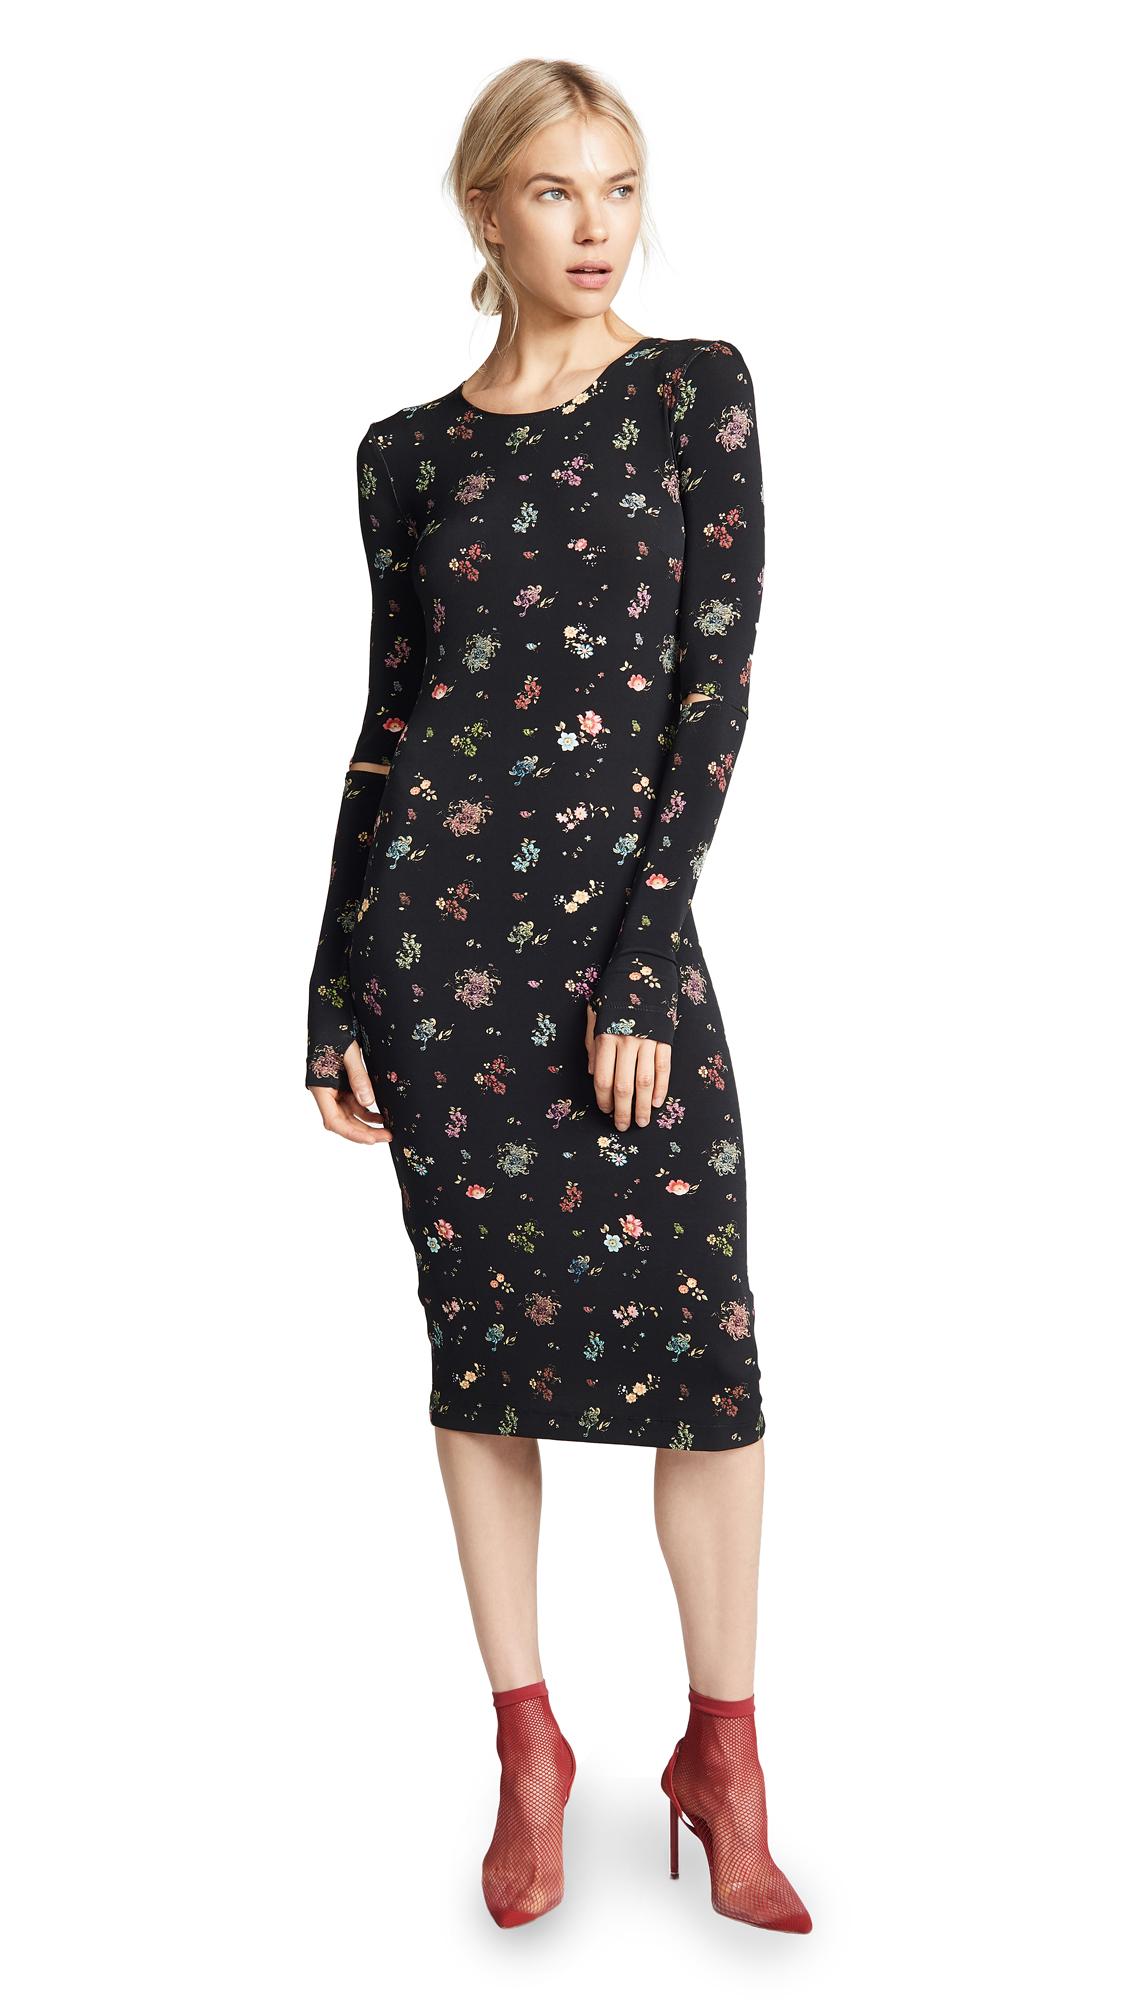 Preen By Thornton Bregazzi Sophie Dress - Black Floral